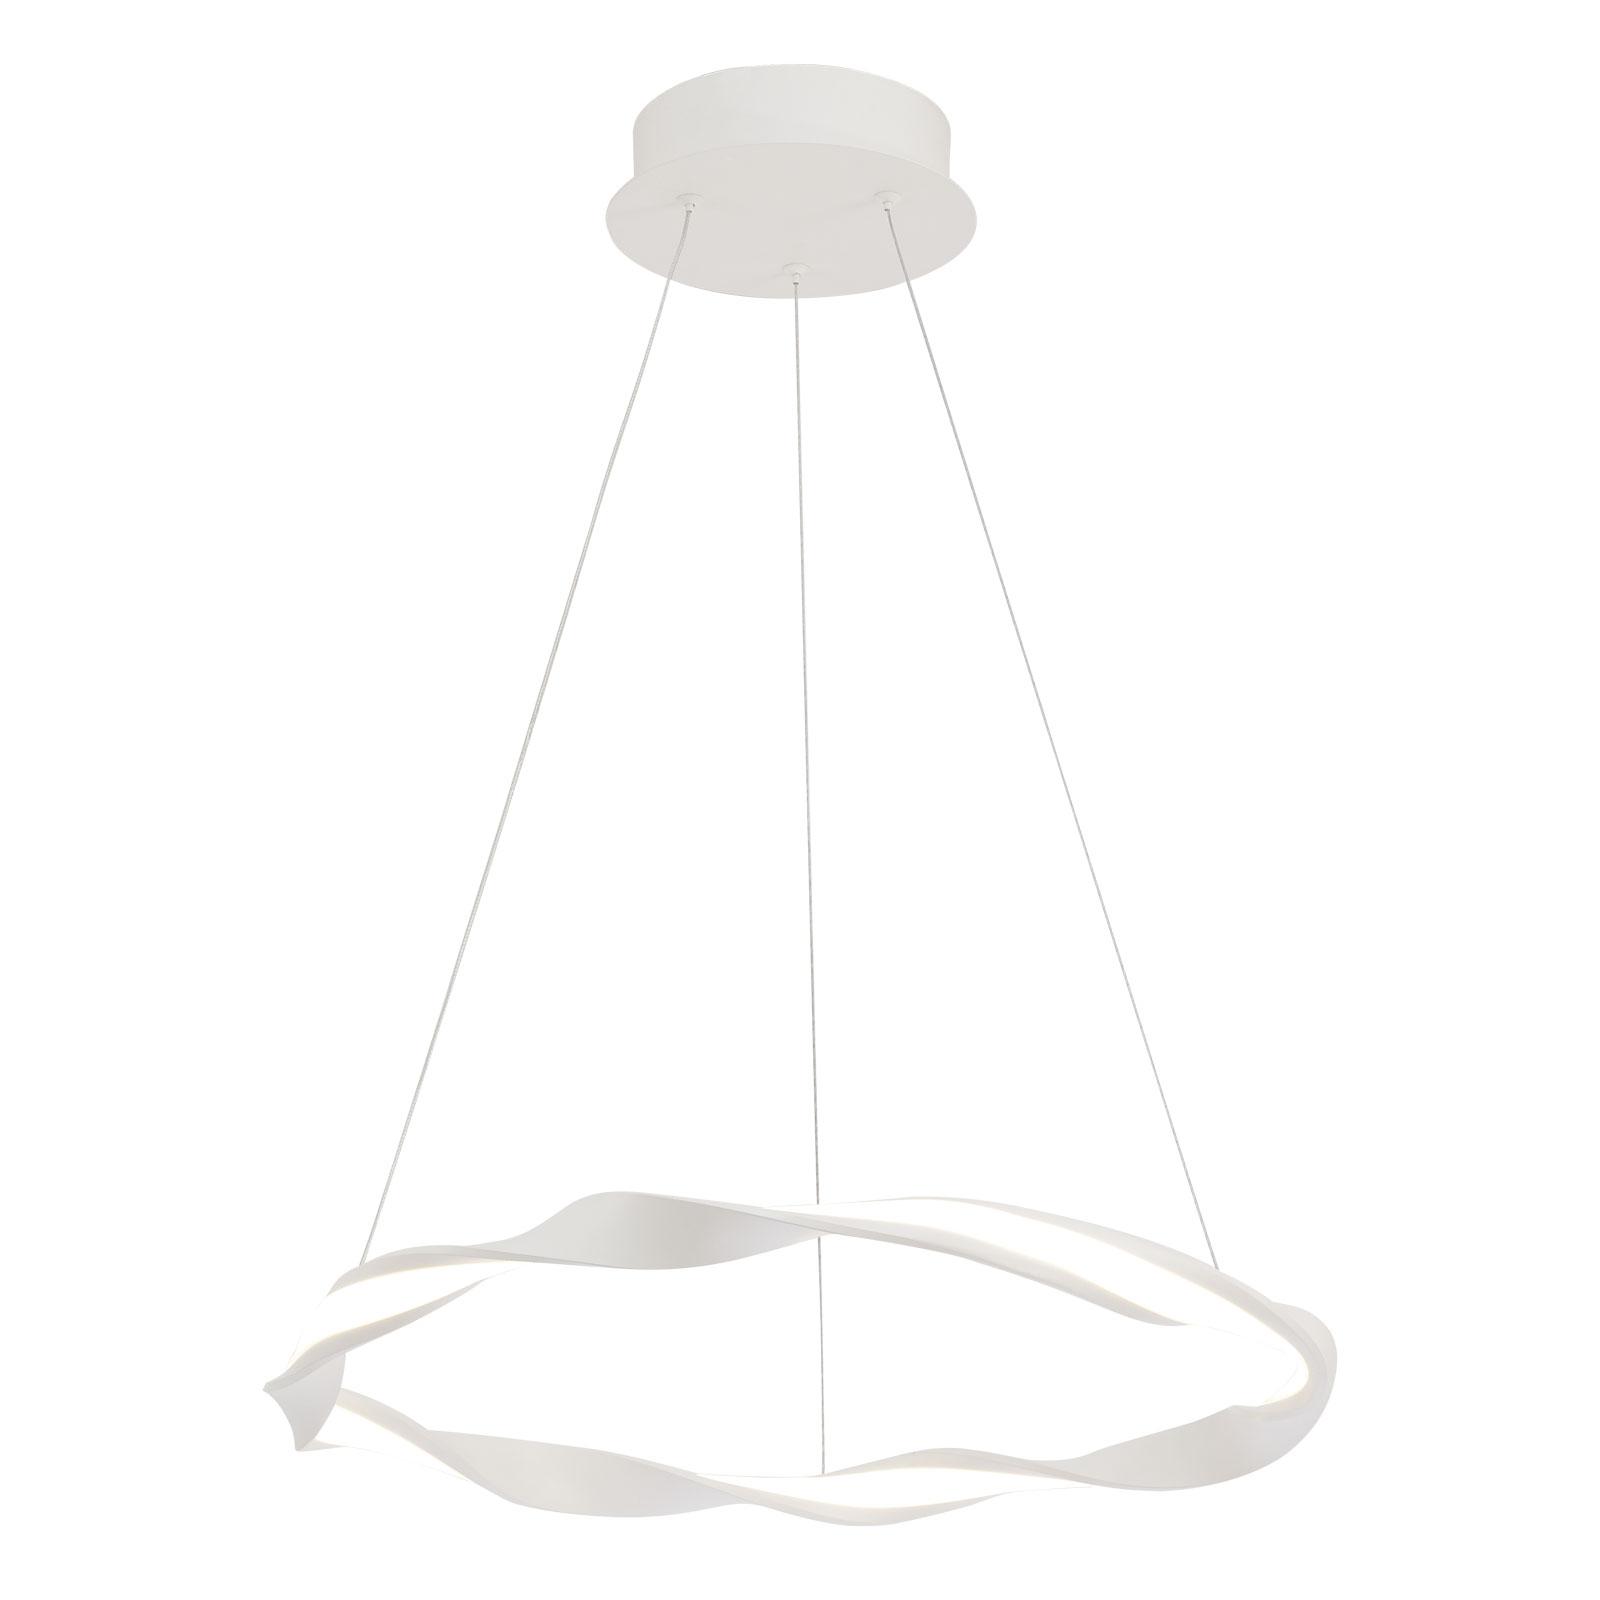 Lampada sospensione LED Madagascar, sabbia Ø 51 cm